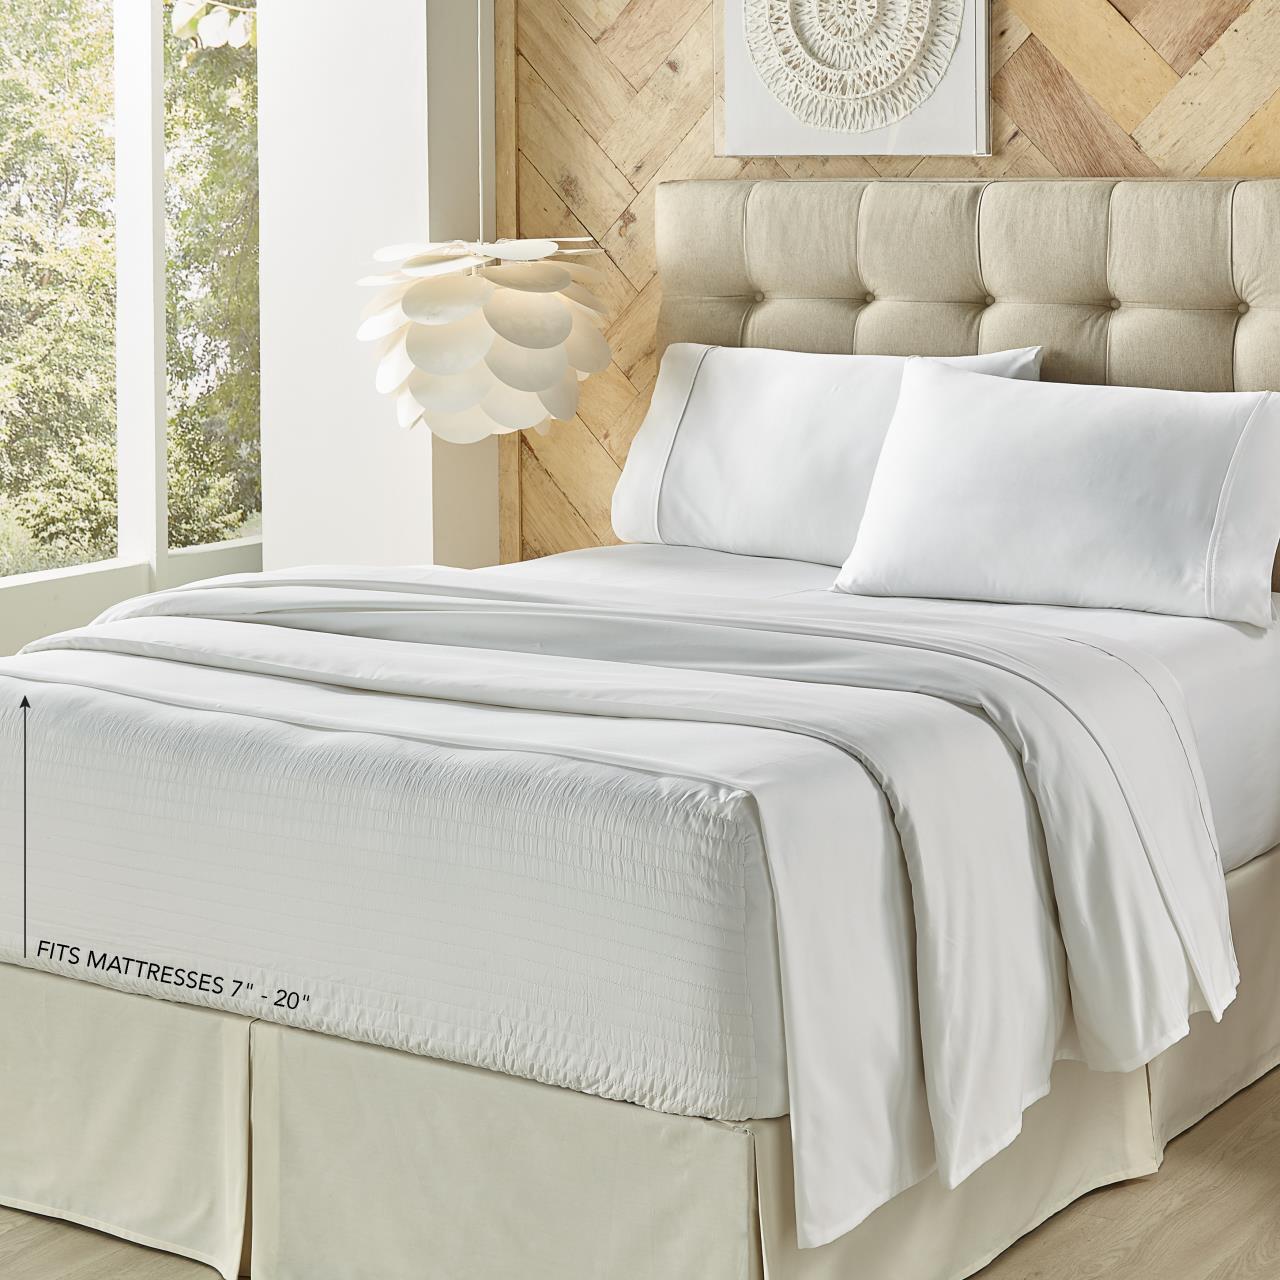 Royal Fit 300 Thread Count 100% Cotton Sheet Set - 193842100639